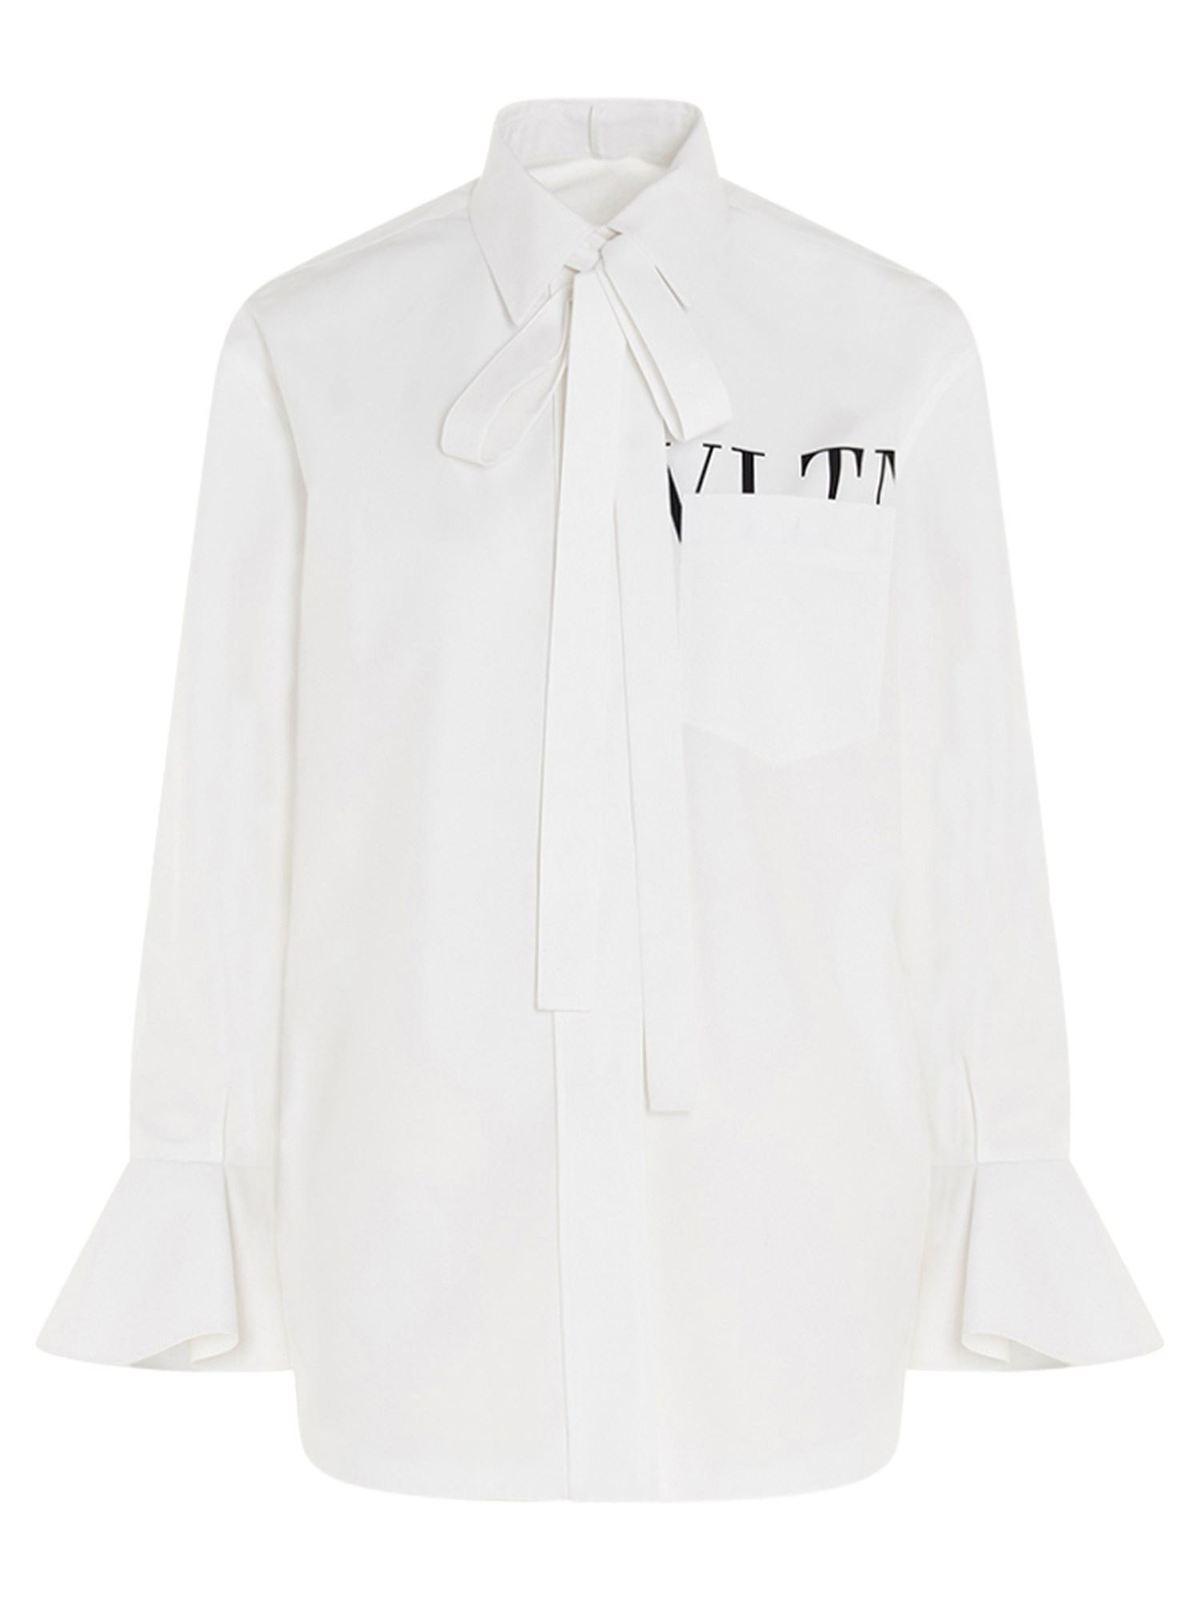 Valentino VLTN LOGO BOW SHIRT IN WHITE